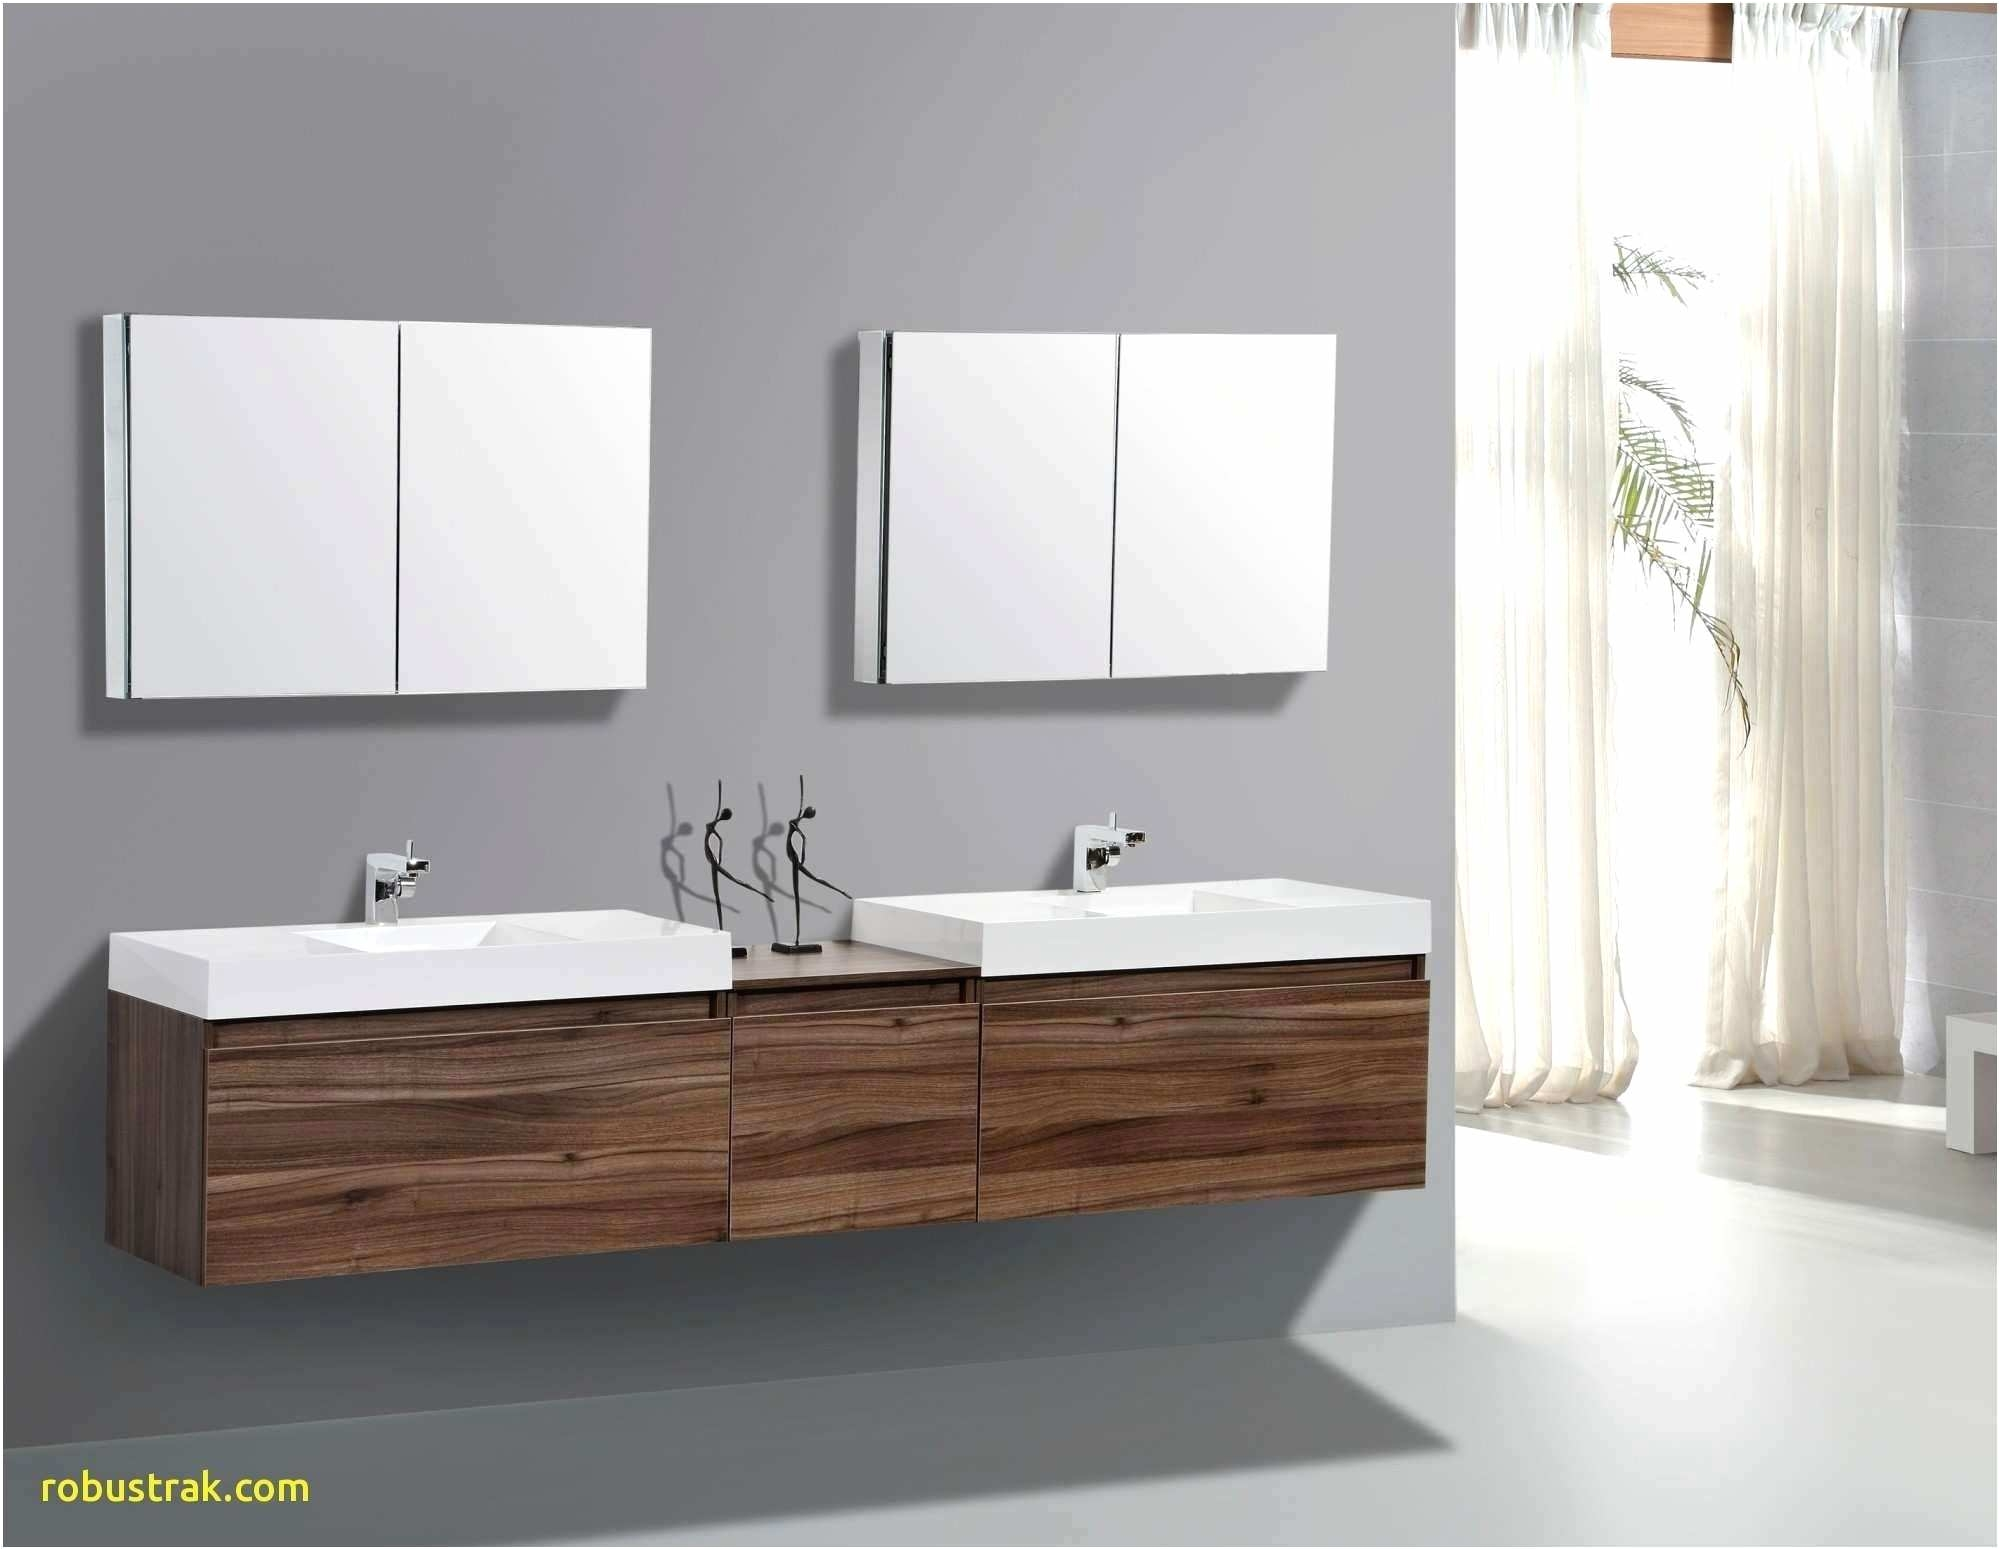 kitchen cabinet liners lowes inspirational home design shower corner shelf luxury corner bath tubs of kitchen